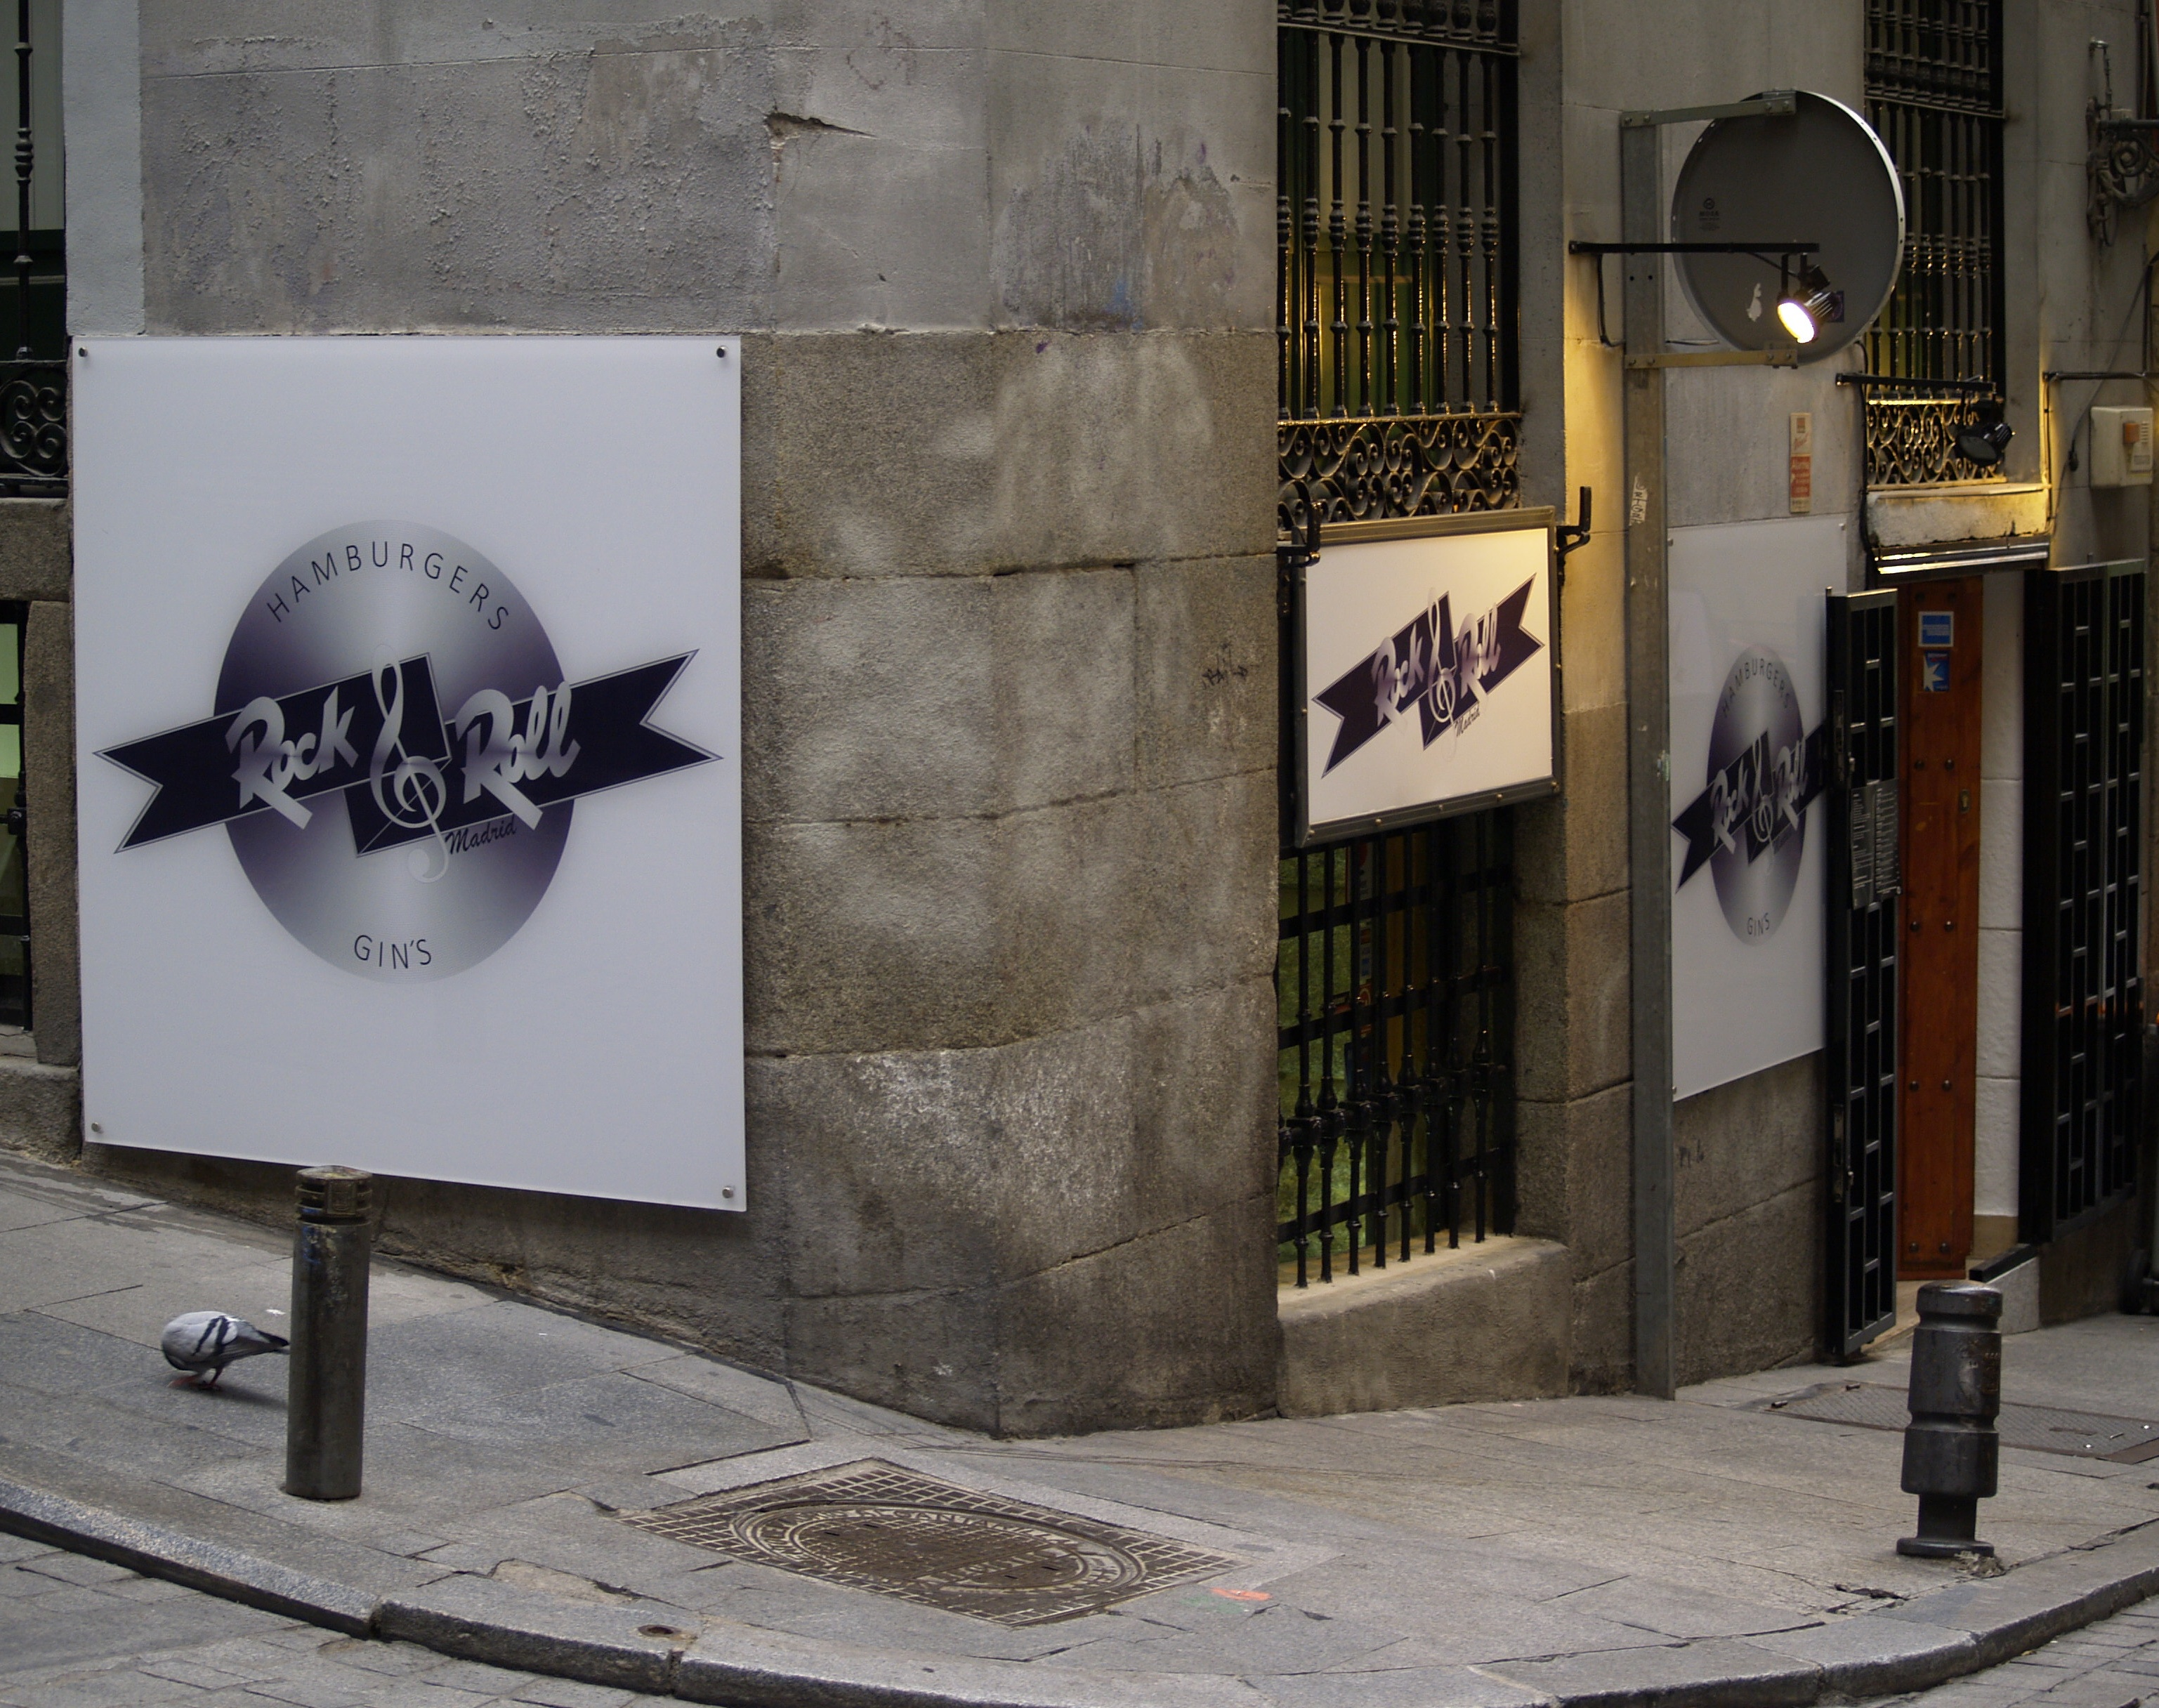 Rock&Roll Madrid